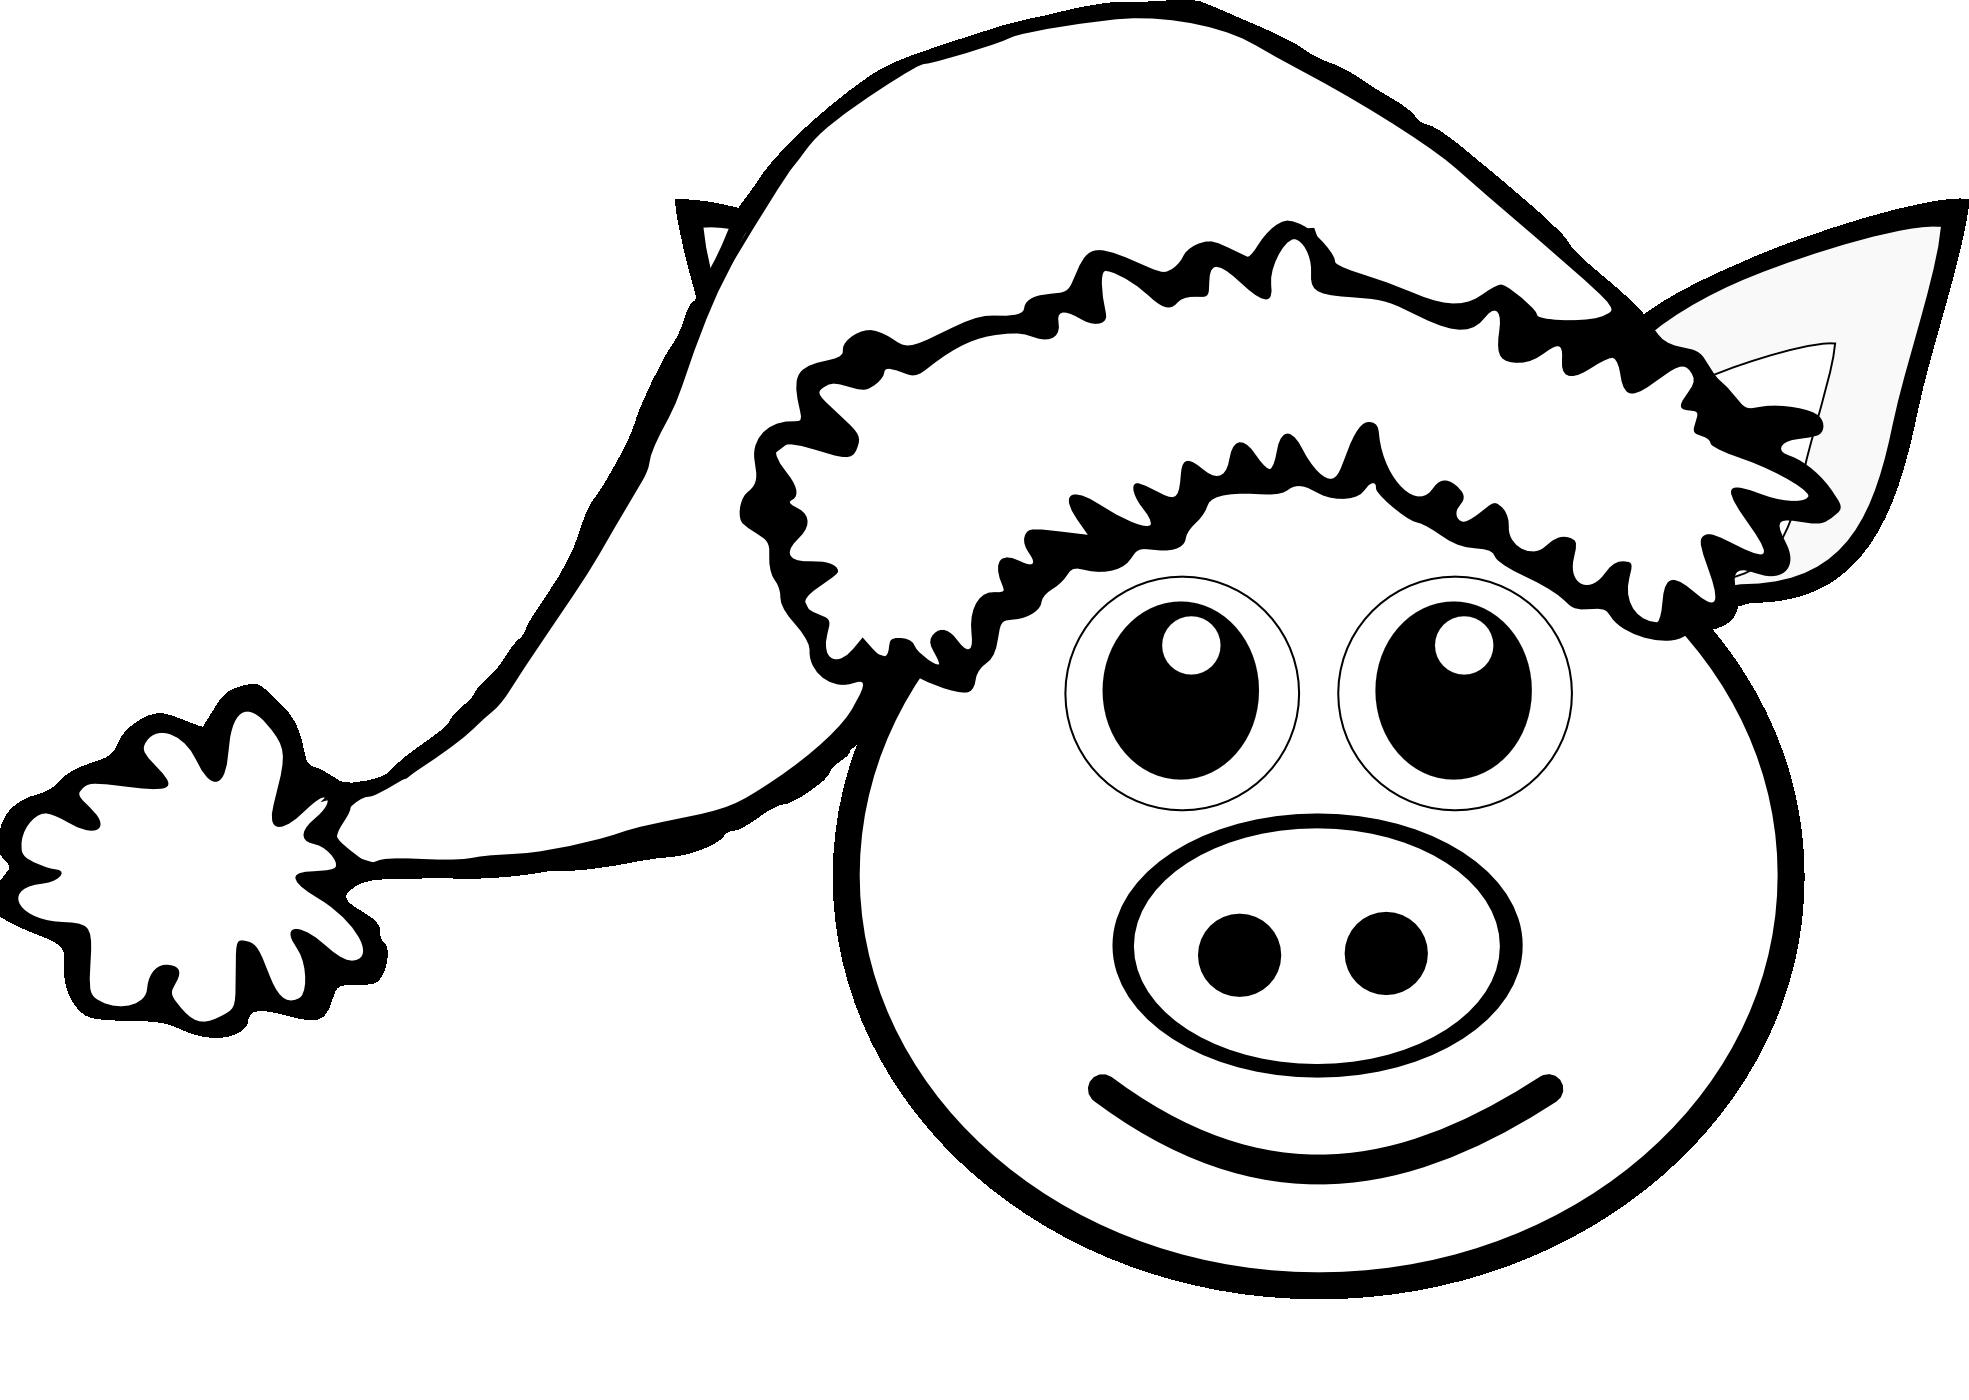 Eye clipart pig. Face panda free images